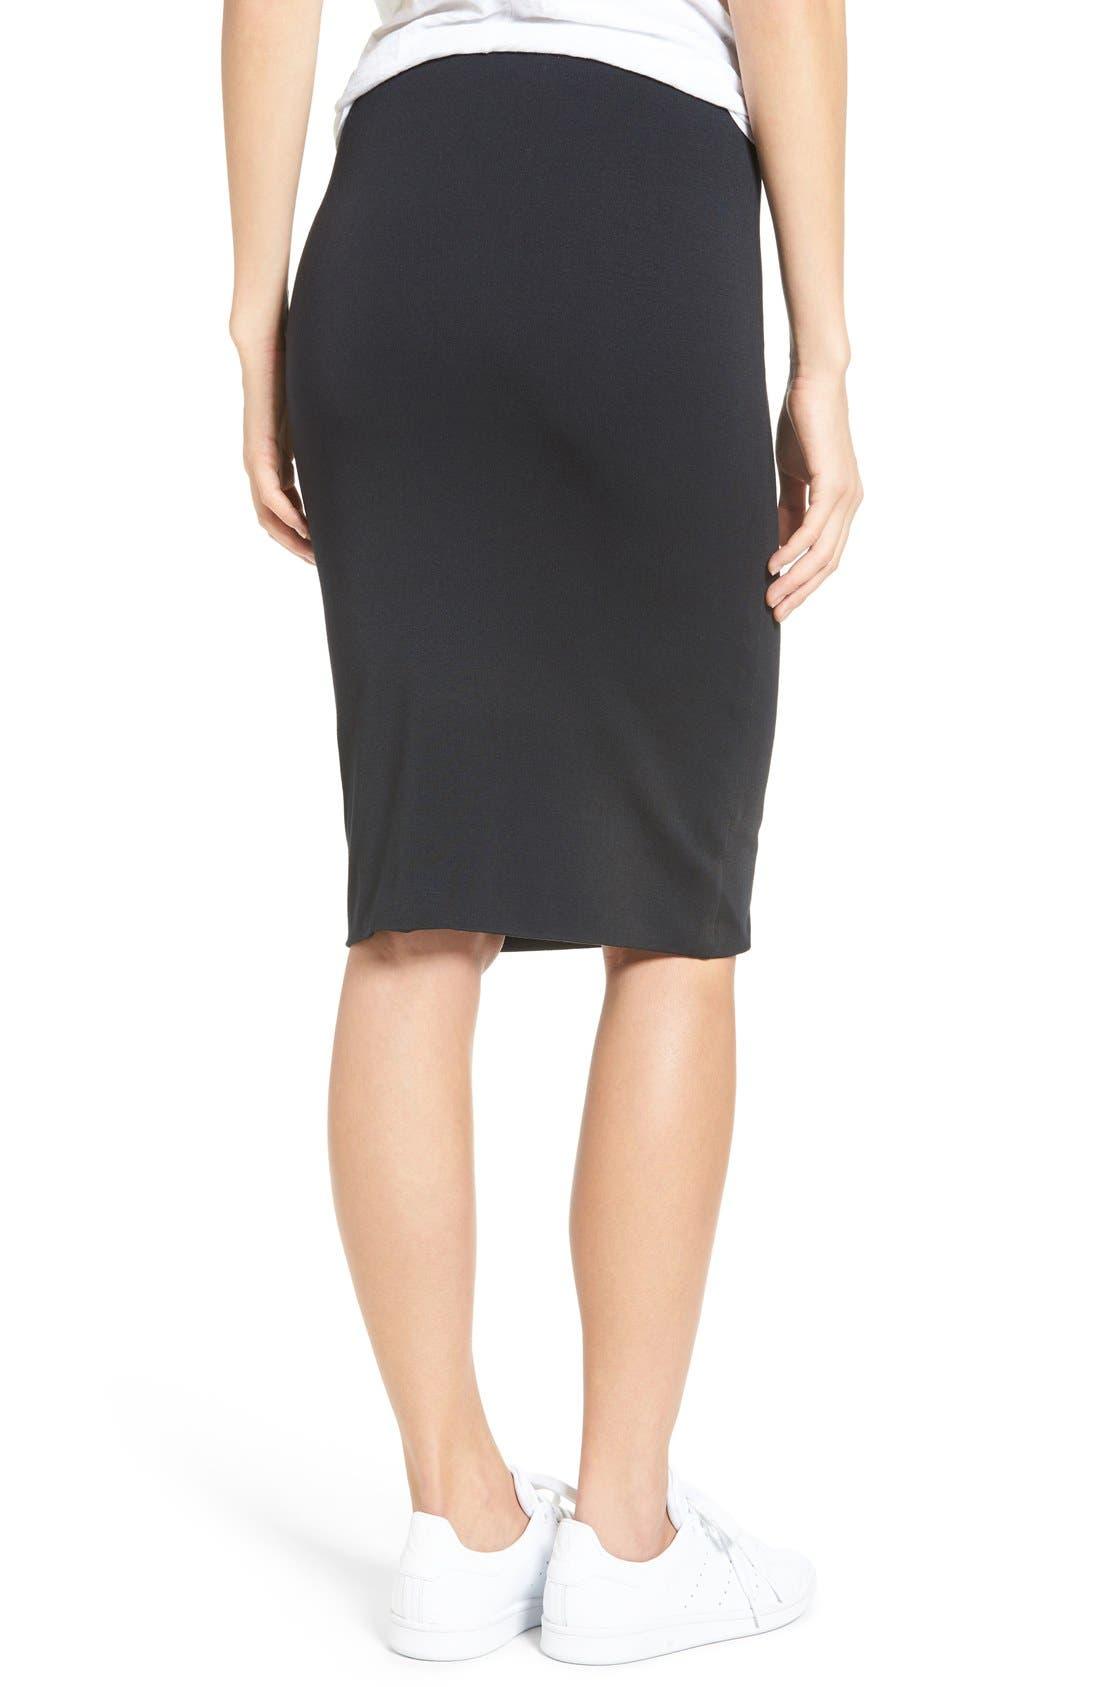 Alternate Image 2  - Amour Vert 'Yuma' Stretch Knit Skirt